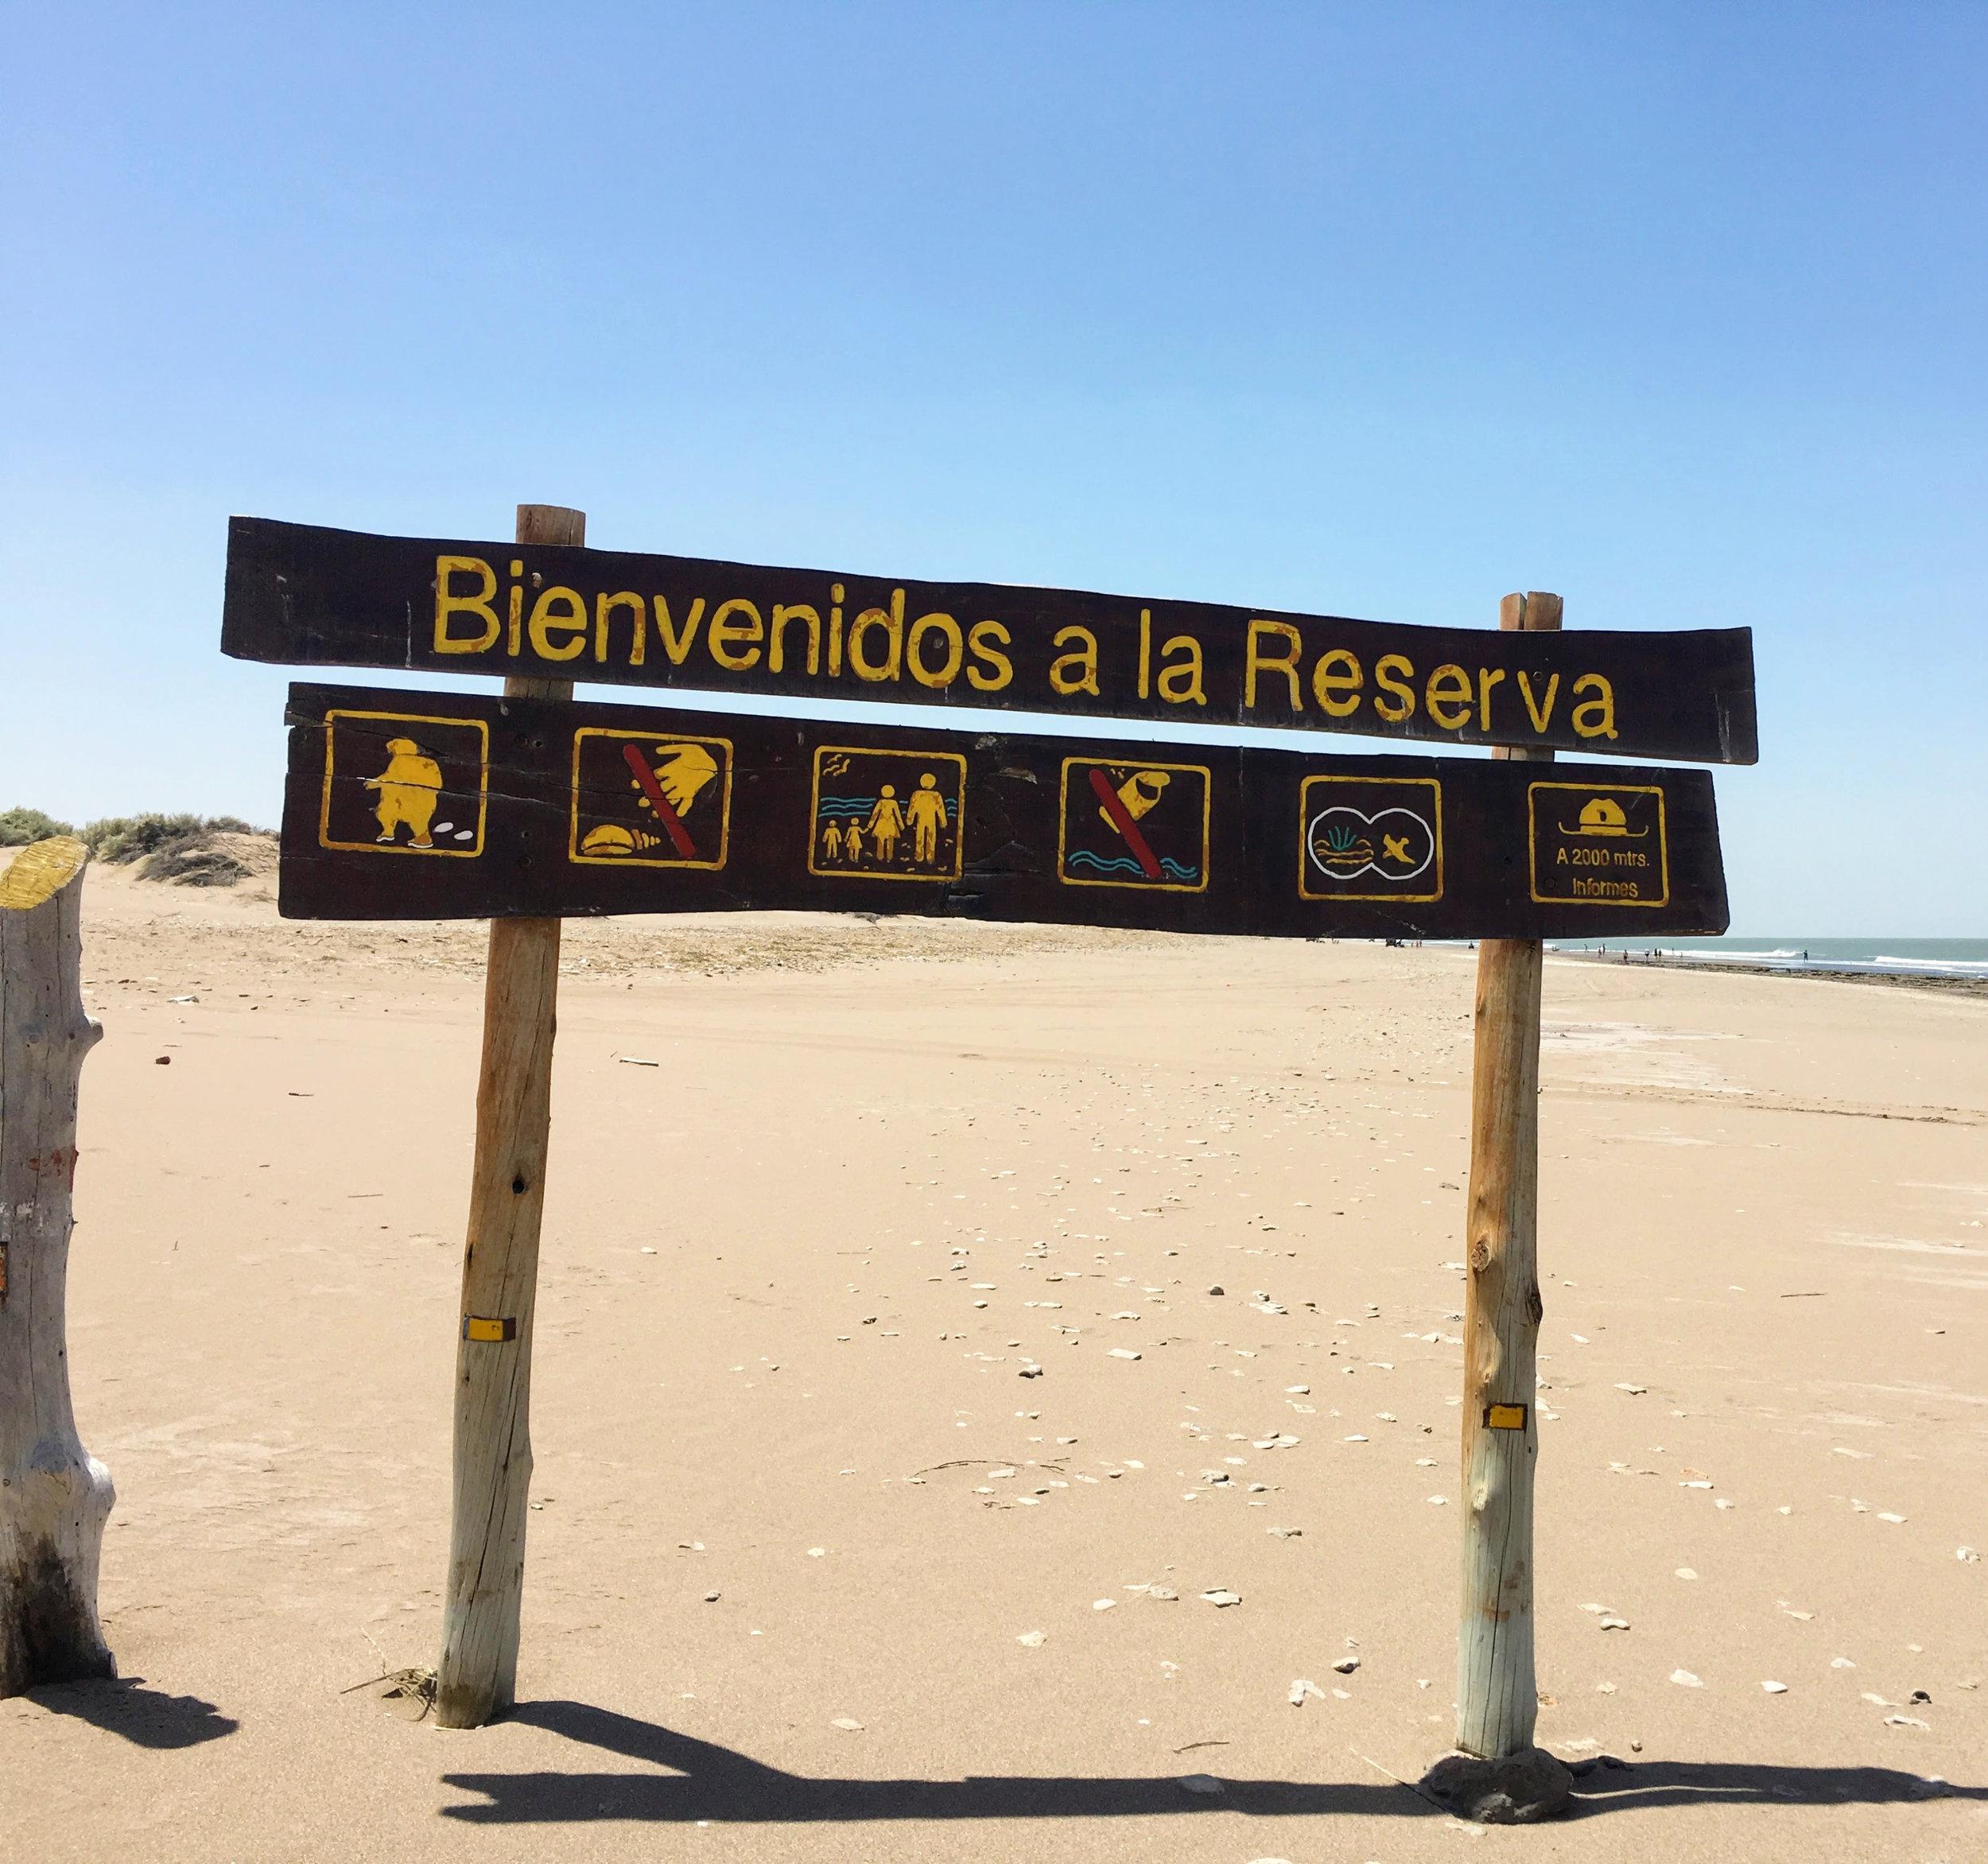 pehuen co costa argentina sol.jpg